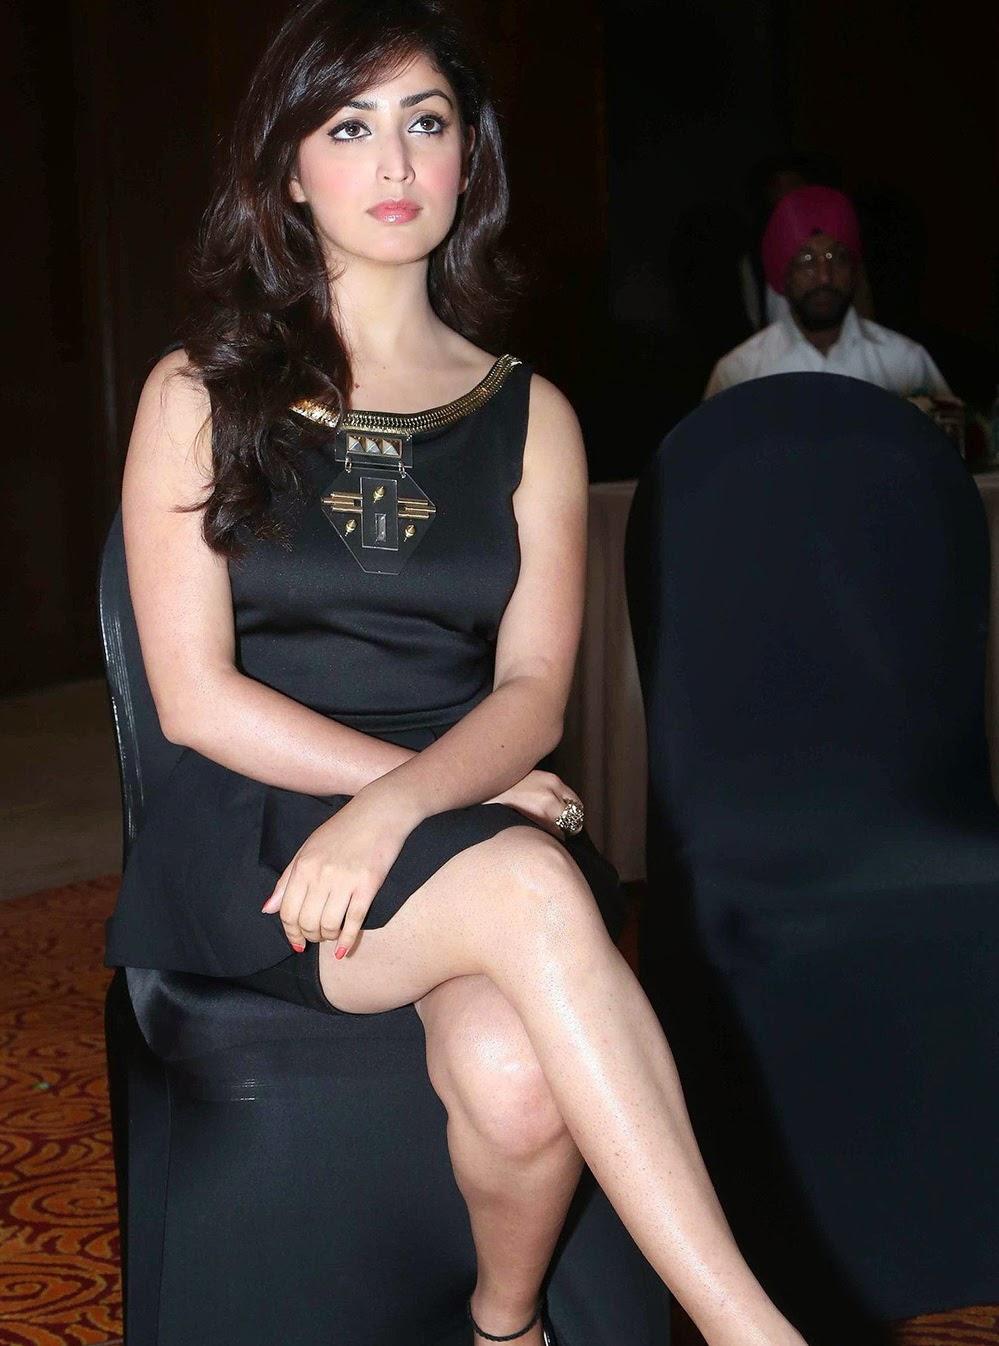 Yami Gautam Sexy Dress New Photos Bollywood Star - SHINER ...